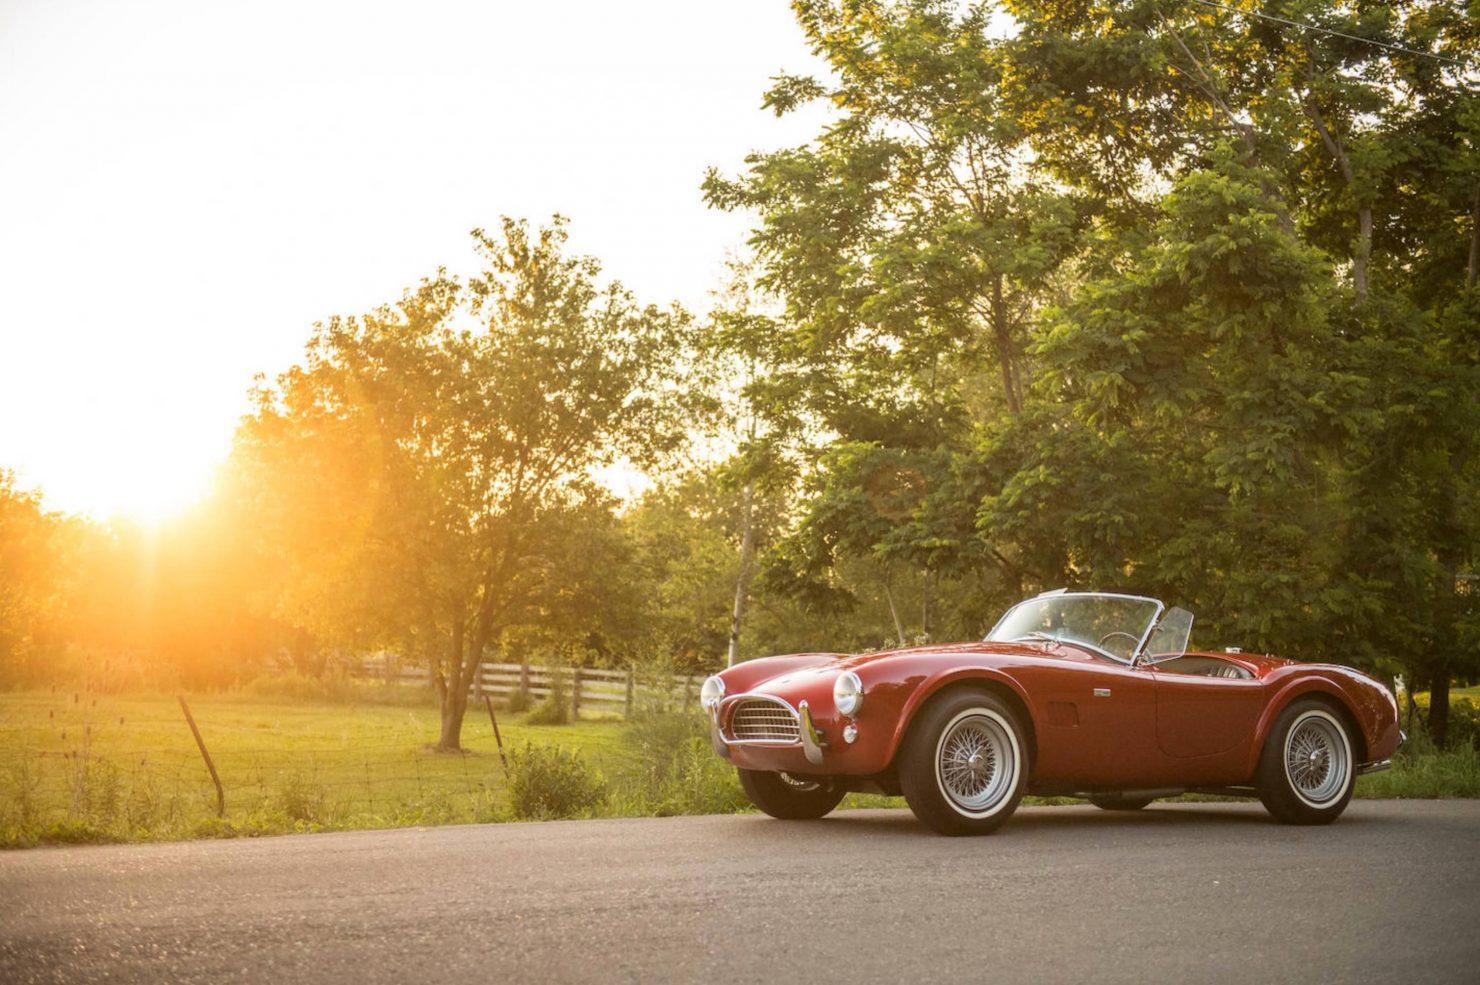 shelby ac cobra 289 23 1480x985 - 1964 Shelby AC Cobra 289